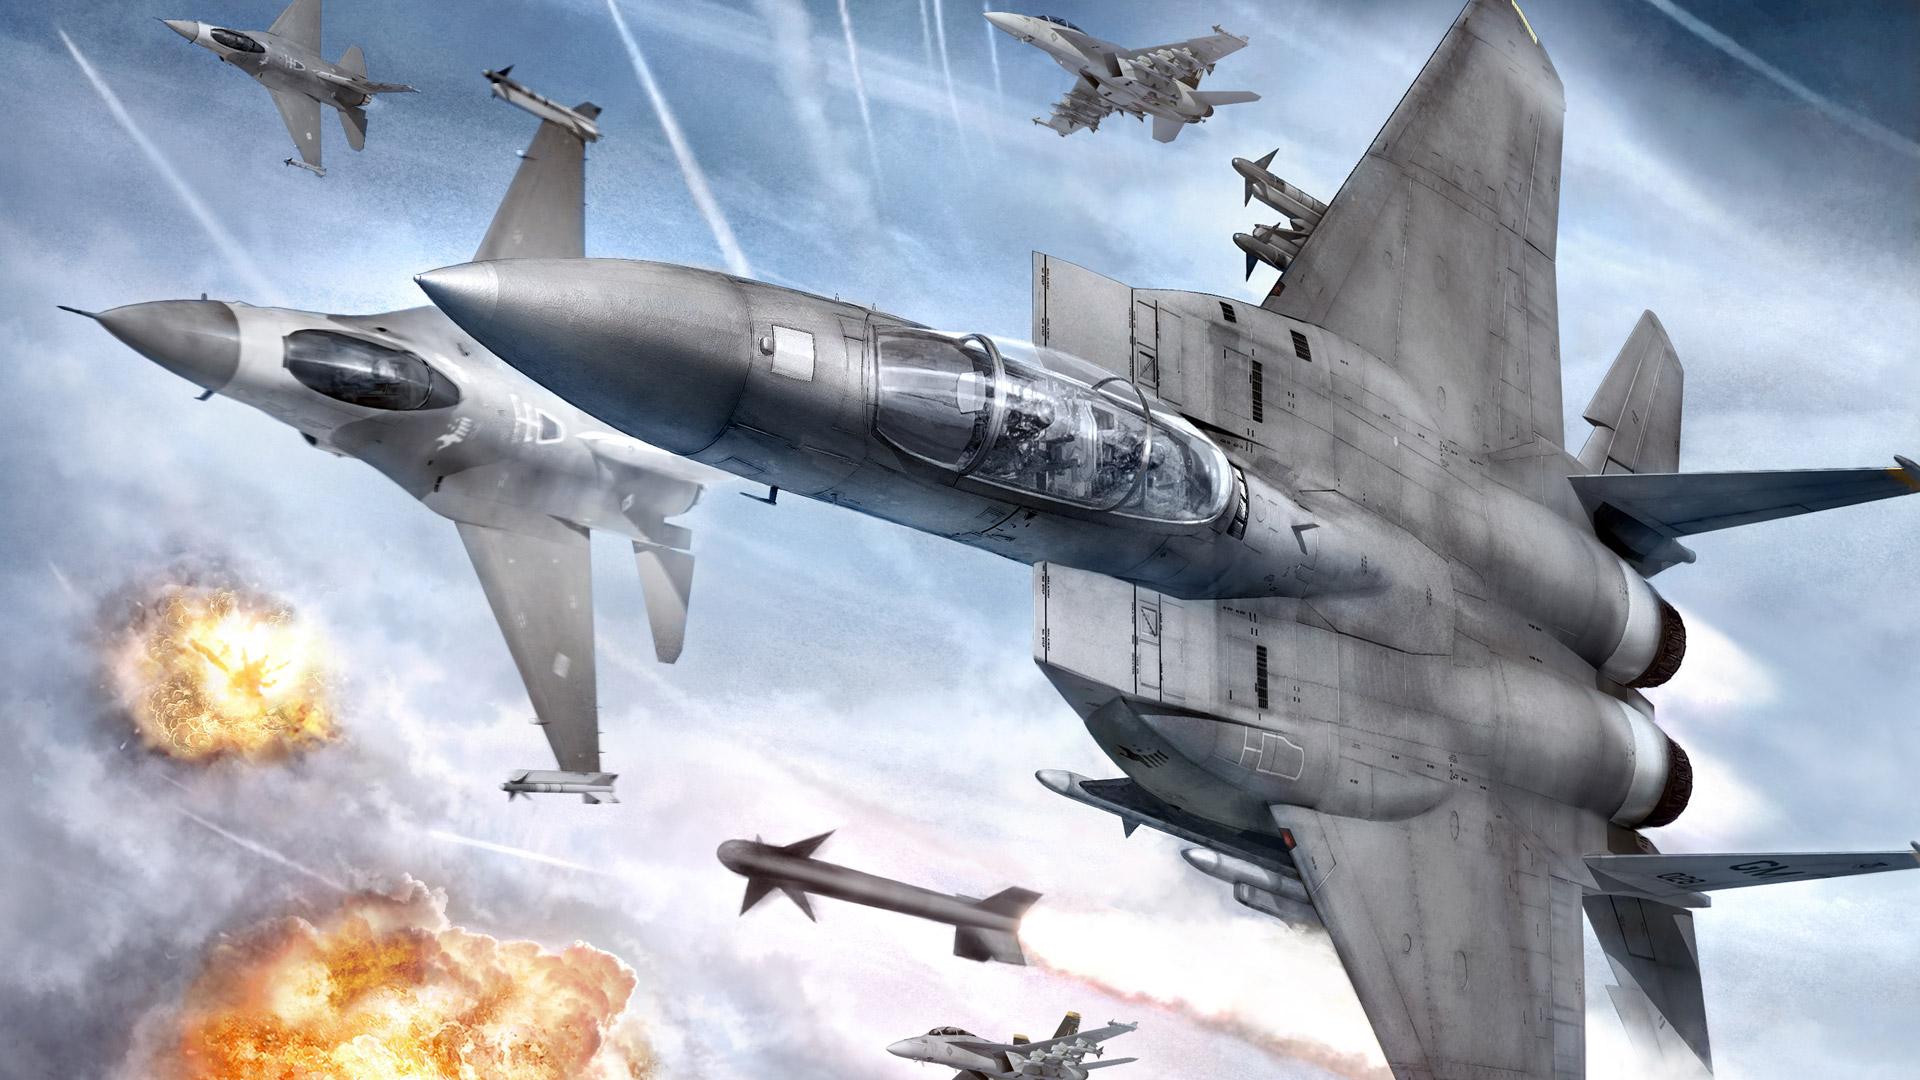 Ace Combat 6 Fires of Liberation wallpaper 1 WallpapersBQ 1920x1080